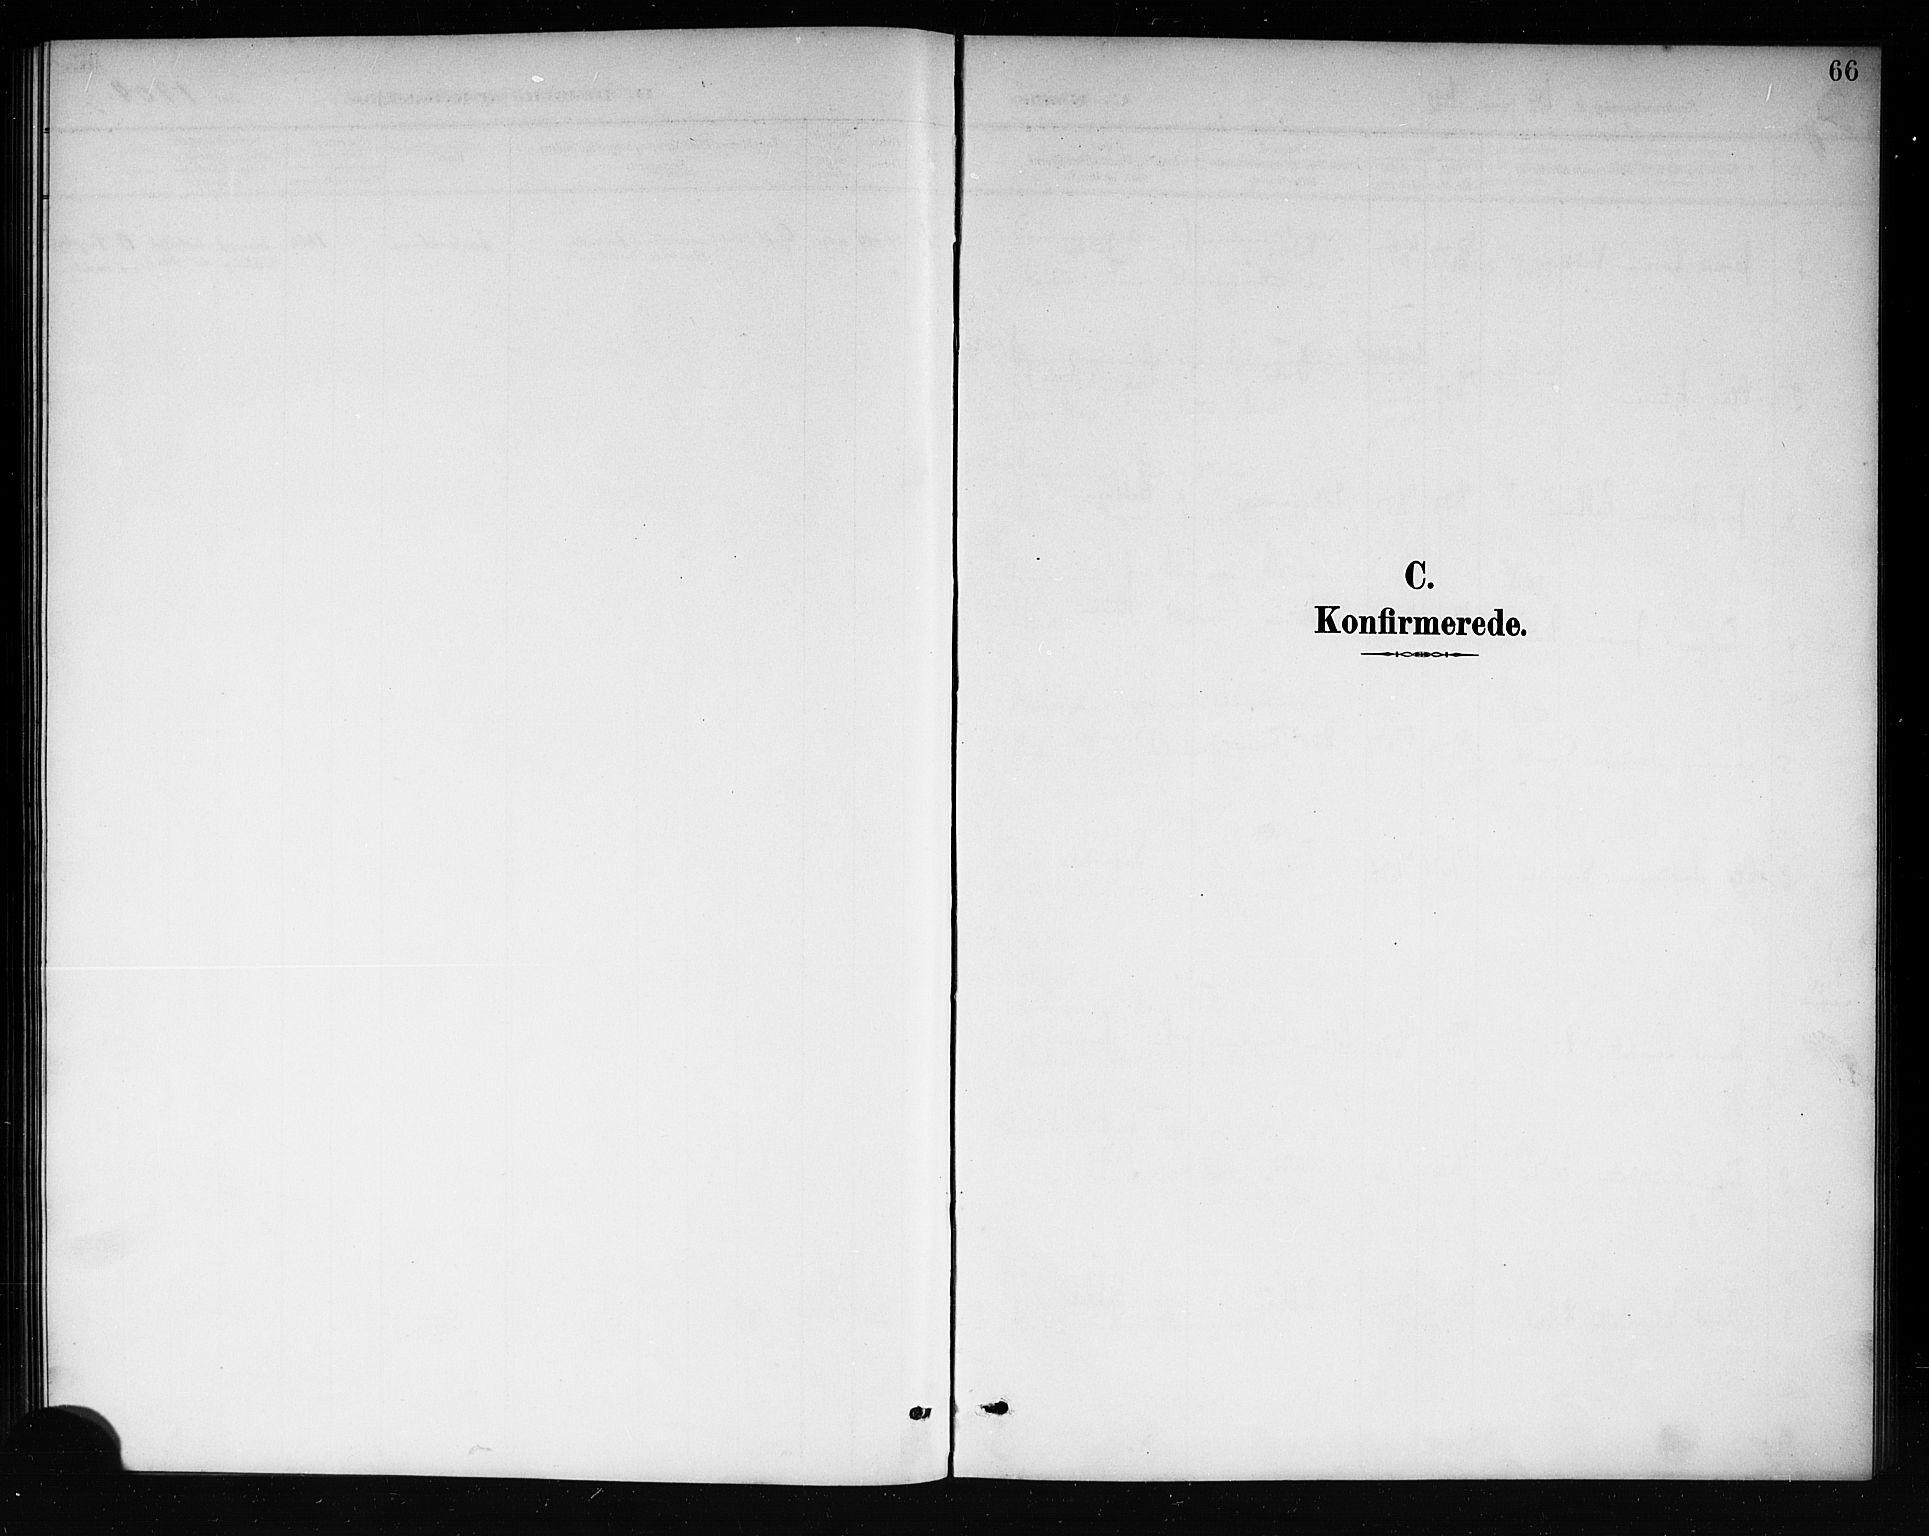 SAKO, Mo kirkebøker, G/Ga/L0002: Klokkerbok nr. I 2, 1892-1914, s. 66